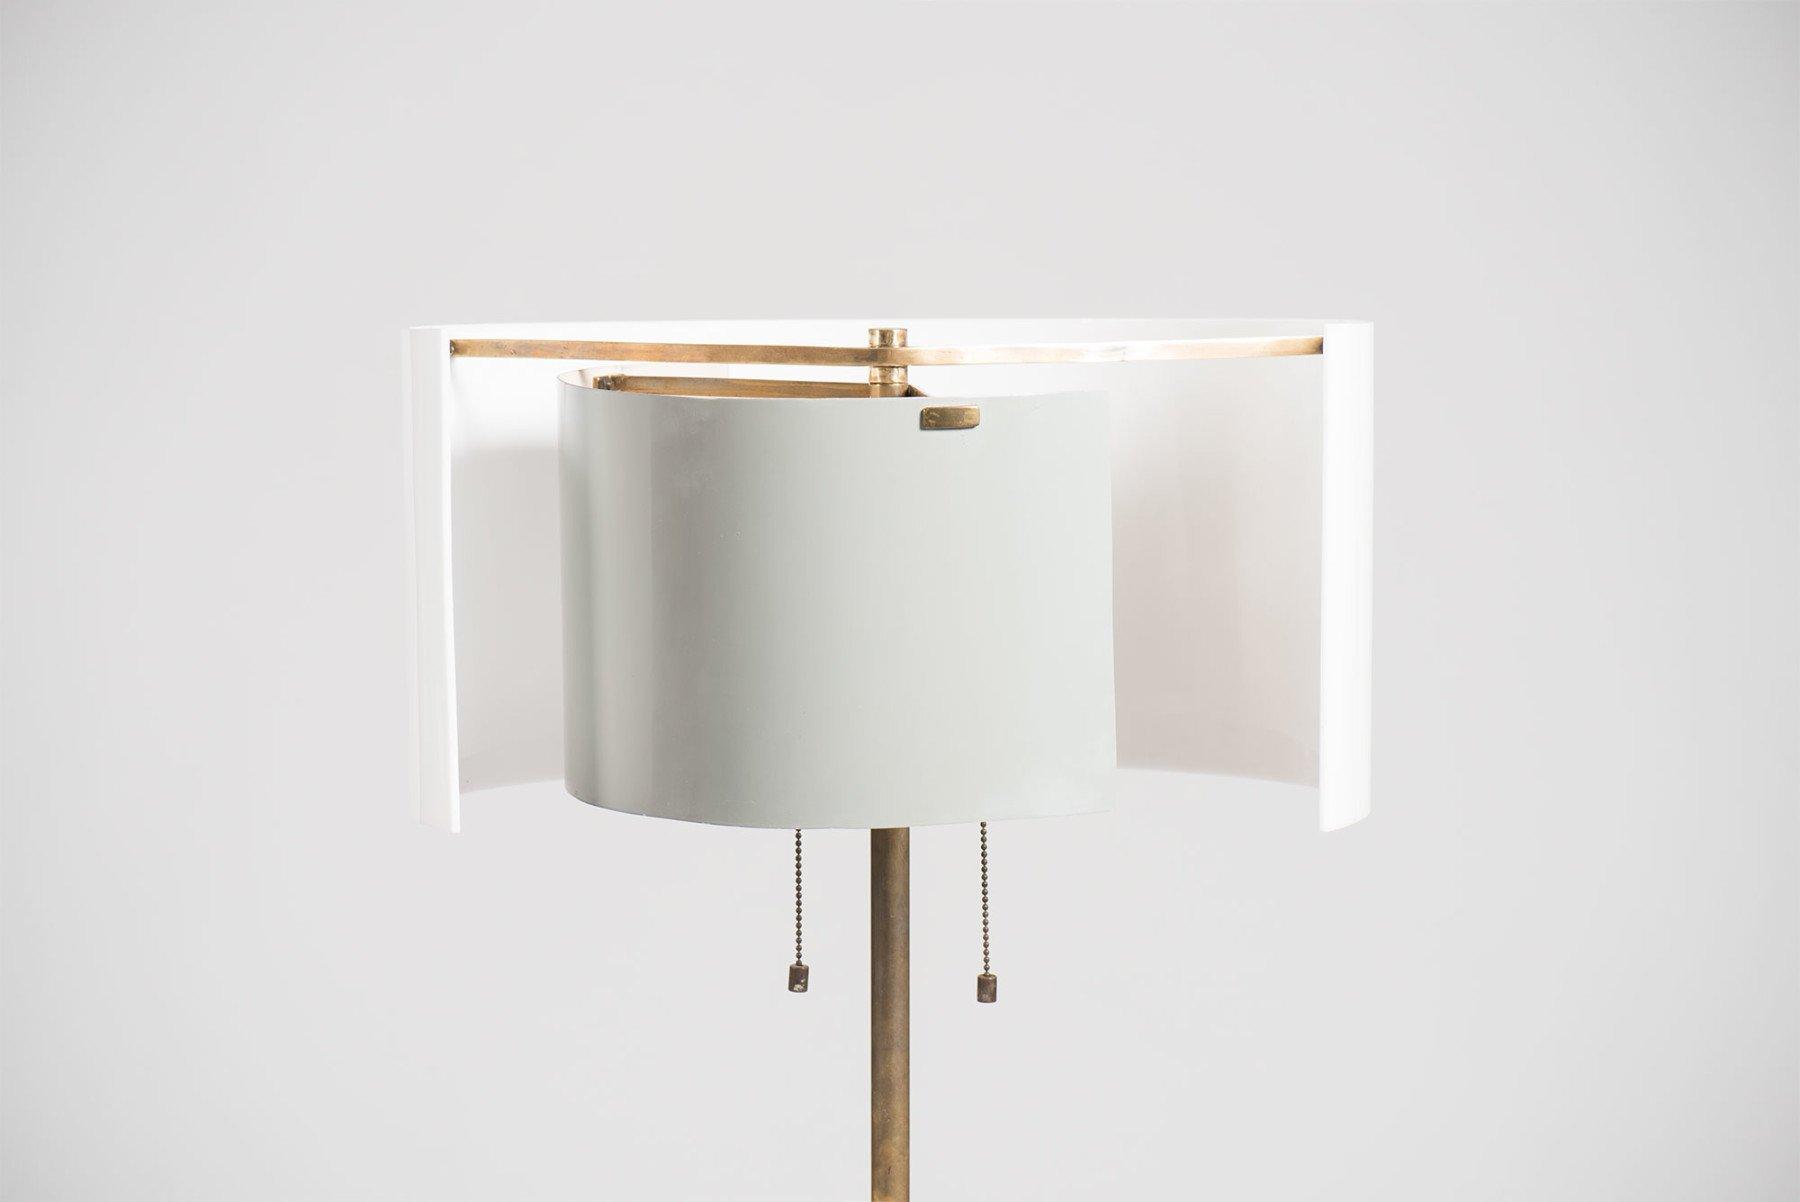 Gino Sarfatti |   Floor lamp, model 1056